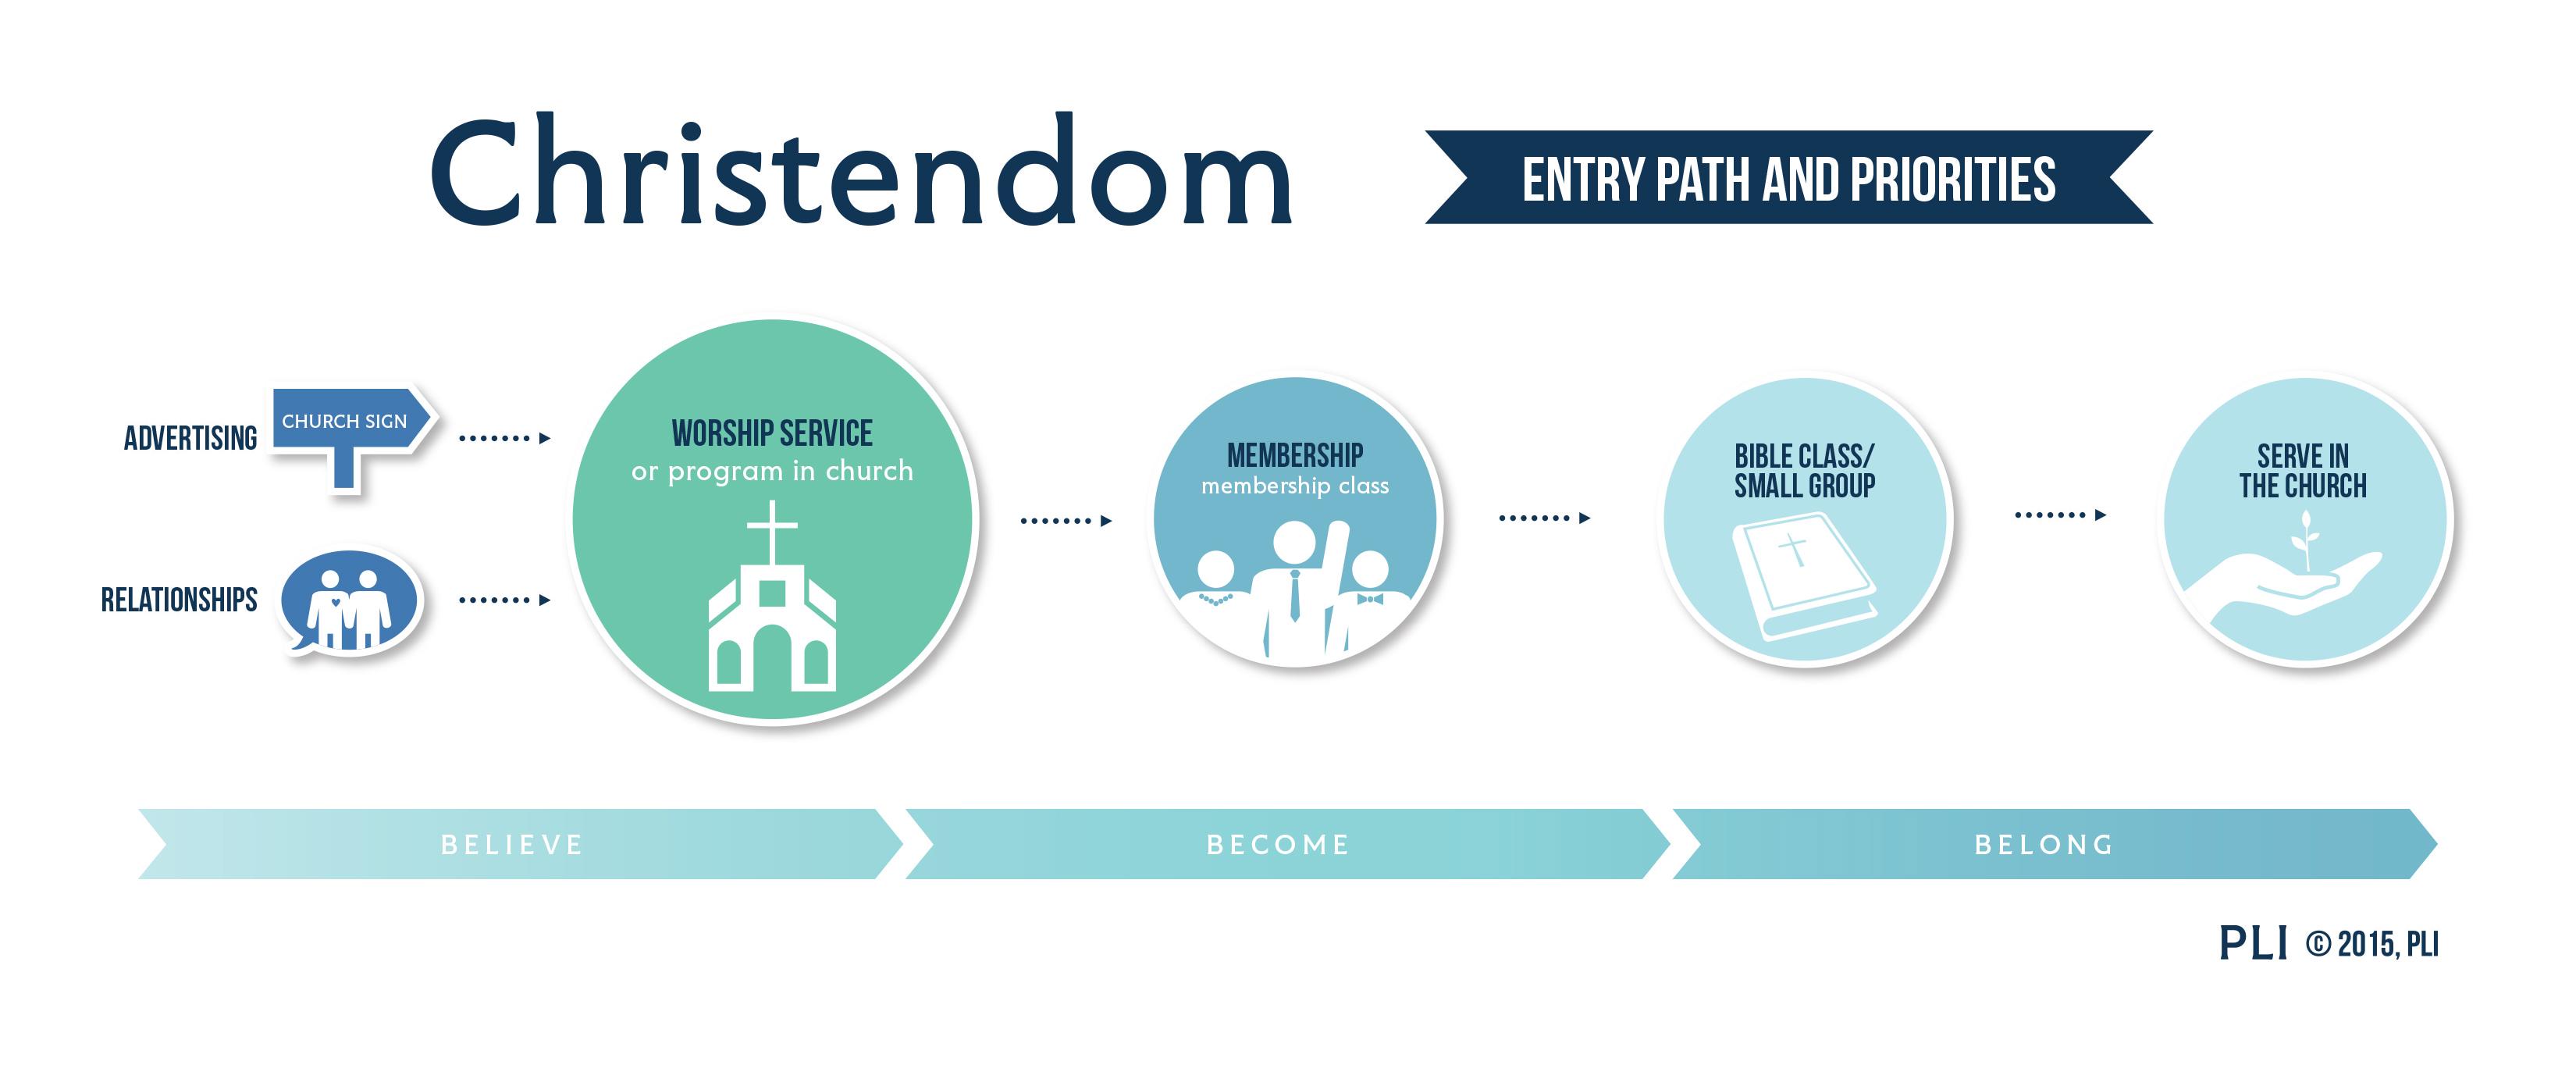 Christendom Entry Path